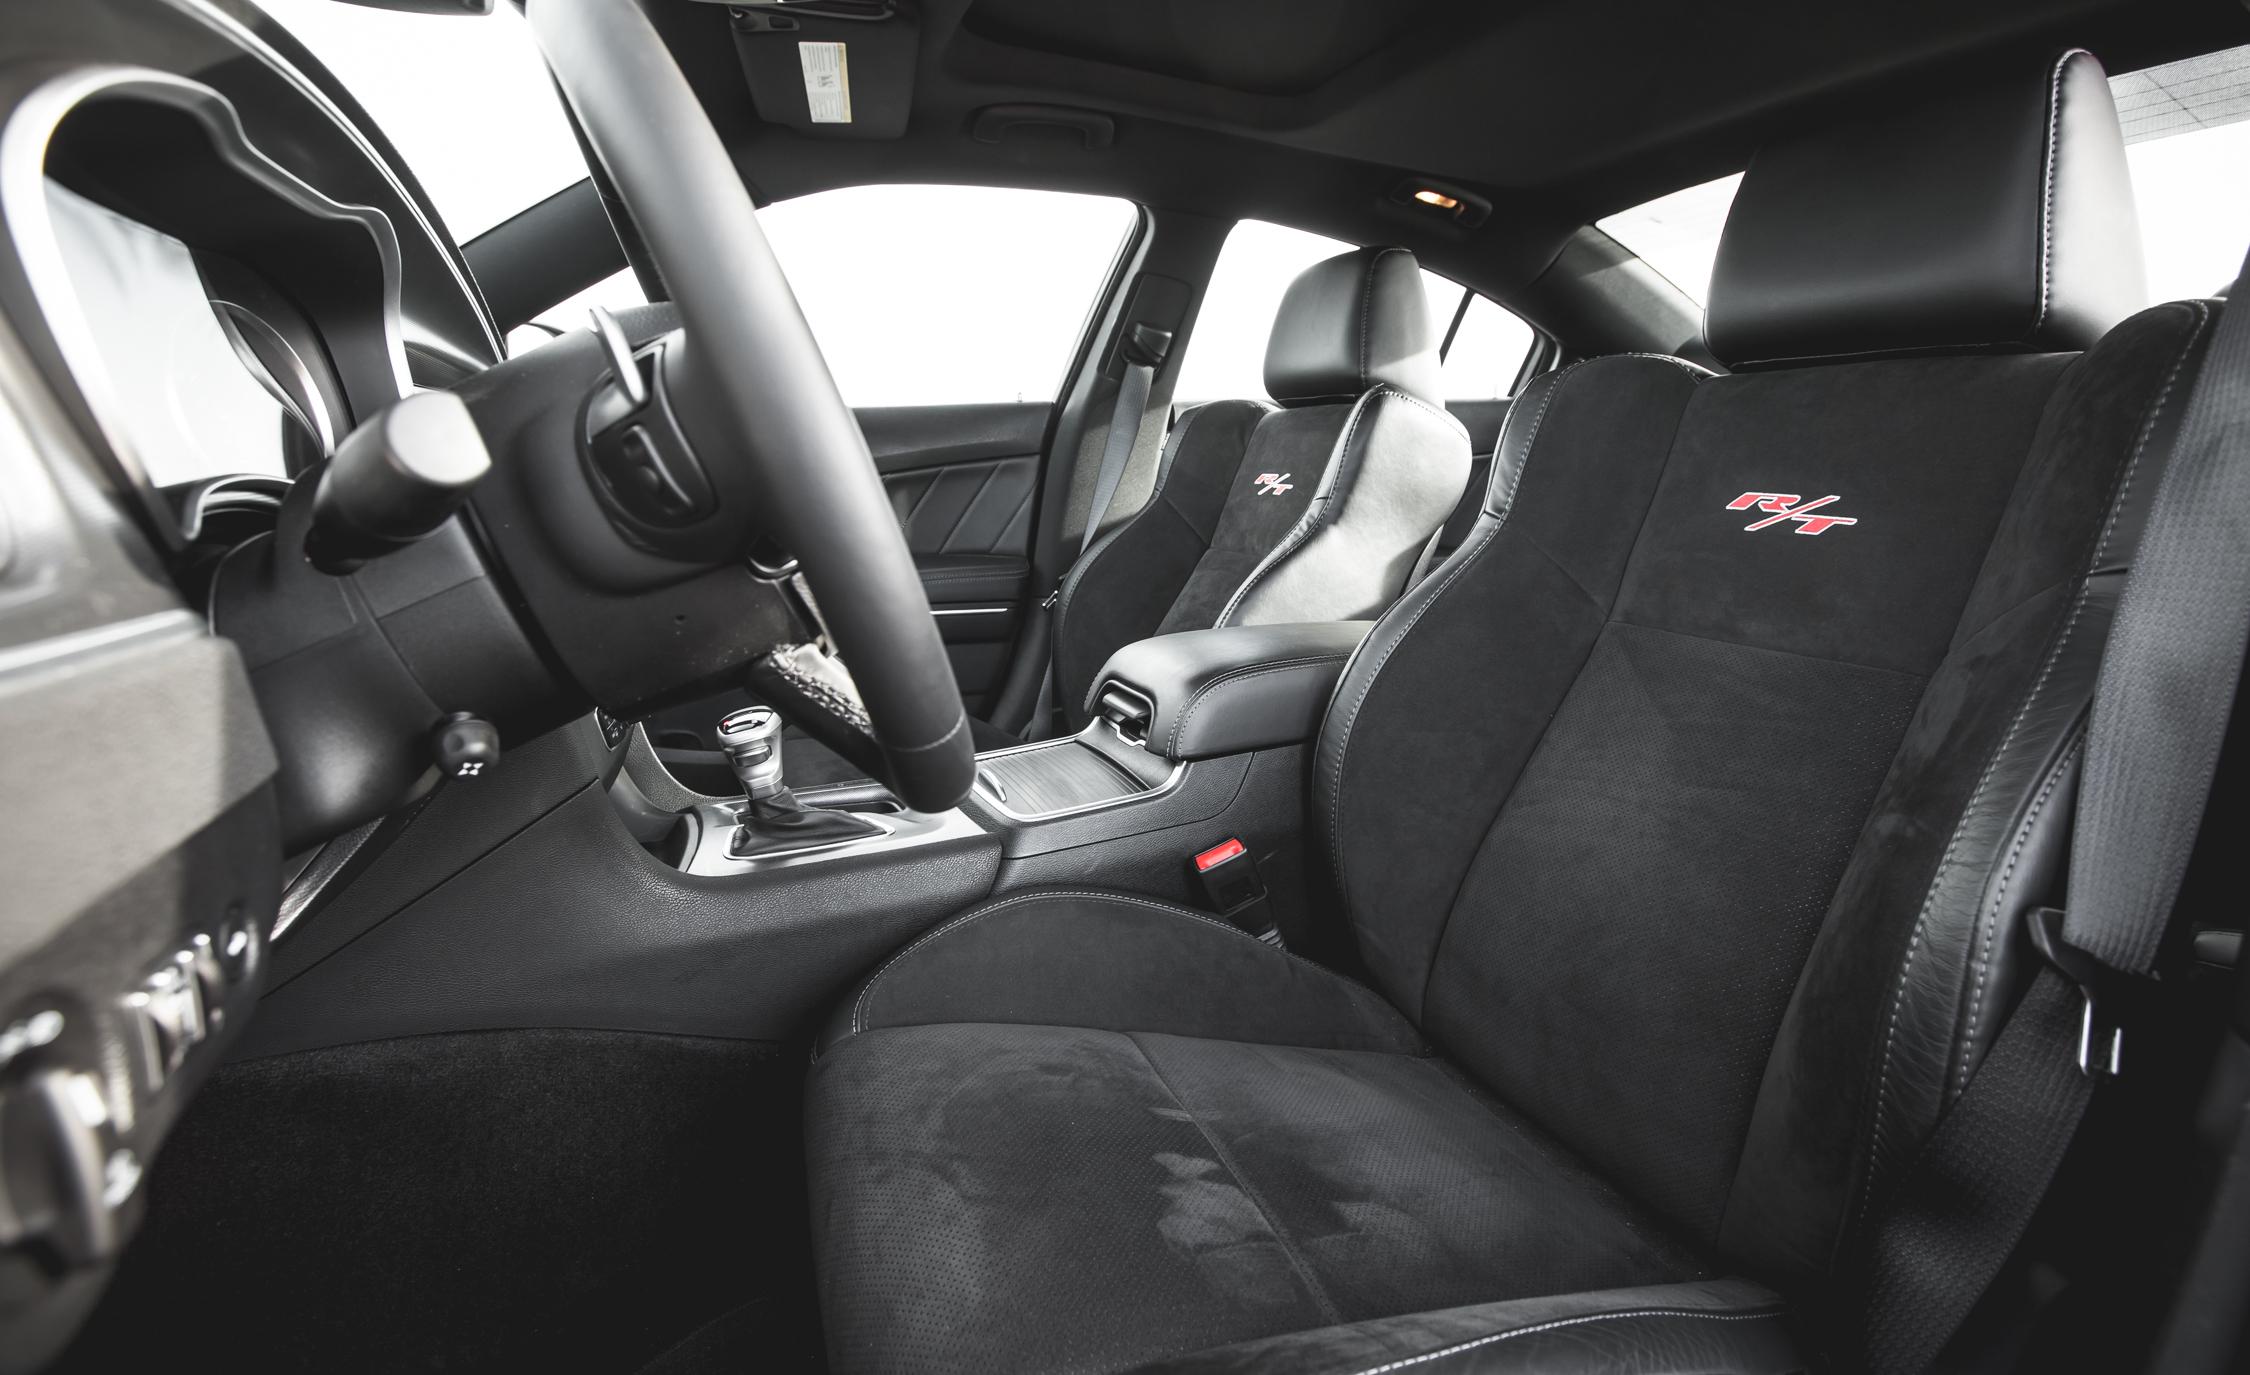 2015 Dodge Charger R/T Interior Cockpit Seat